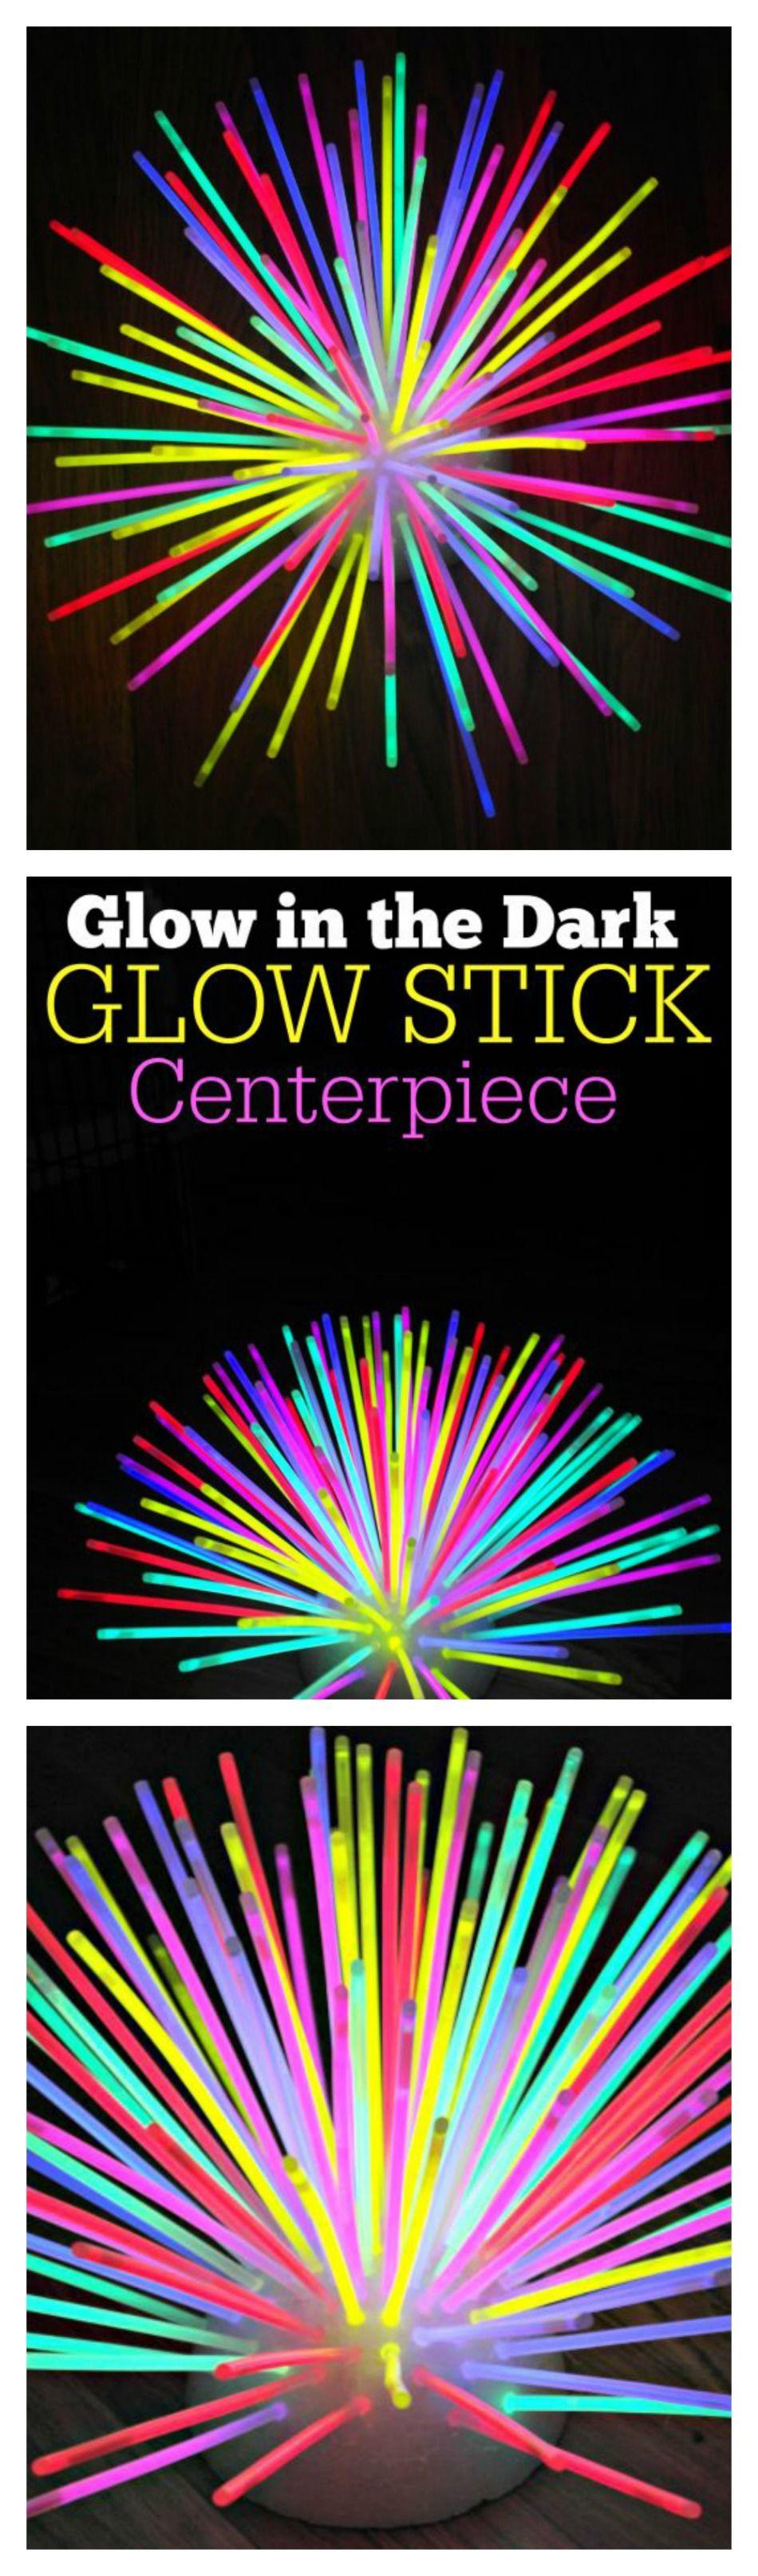 Glow In The Dark Glow Stick Centerpiece Stick Centerpieces Glow Sticks Halloween Party Decor